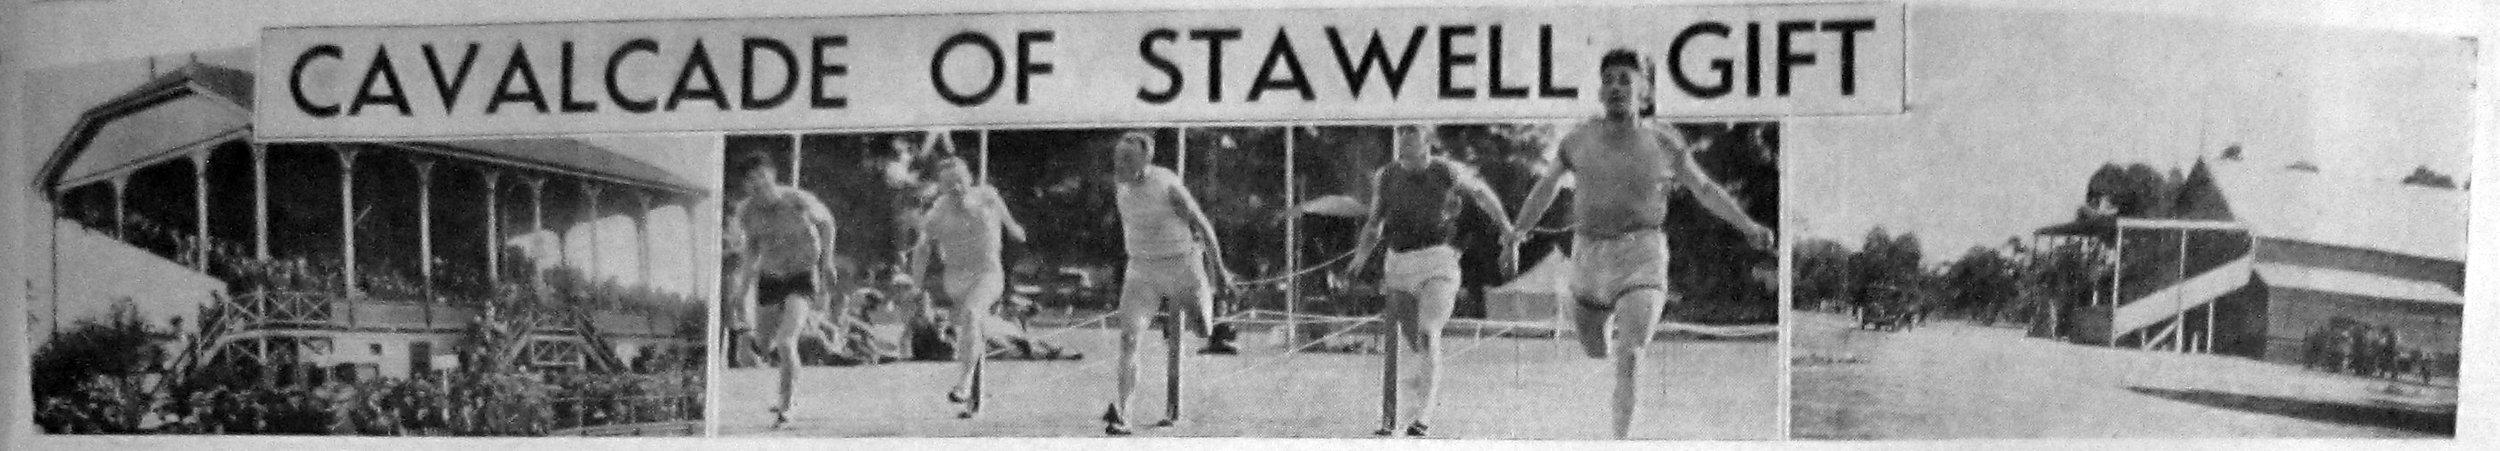 1939 Stawell Picture Sporting Globe 5 April 1939.jpg